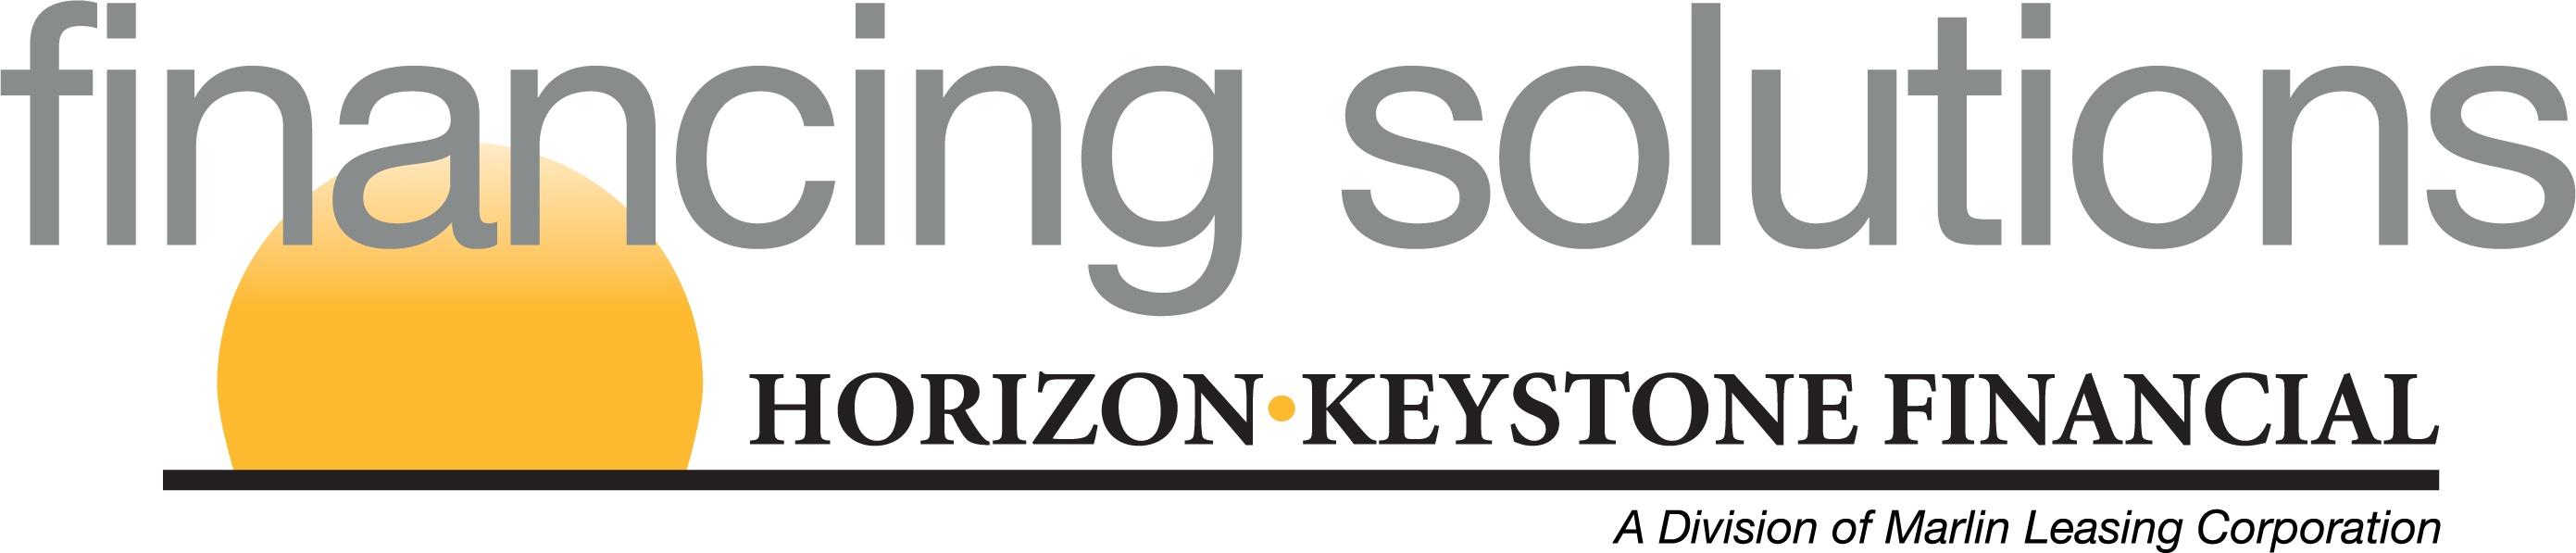 Office Furniture Financing   Horizon Keystone Financial